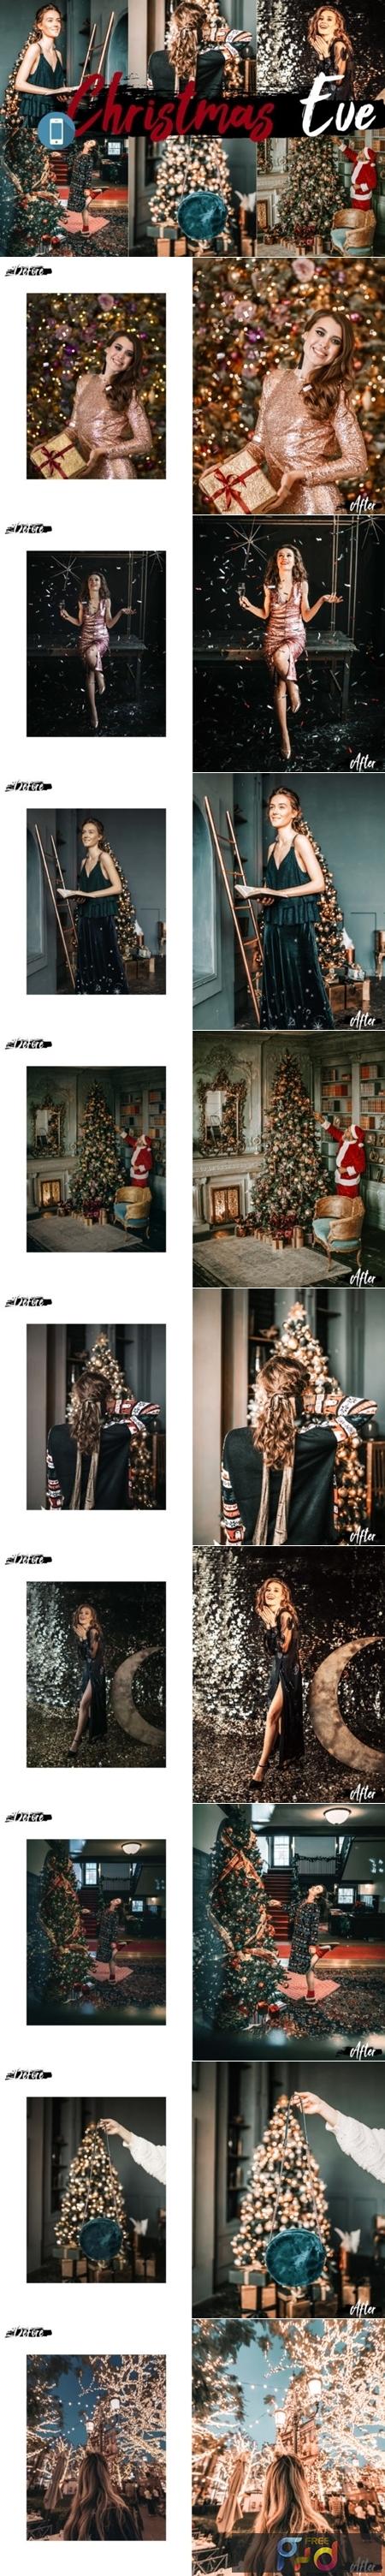 05 Christmas Eve Mobile Lightroom Preset 2239039 1